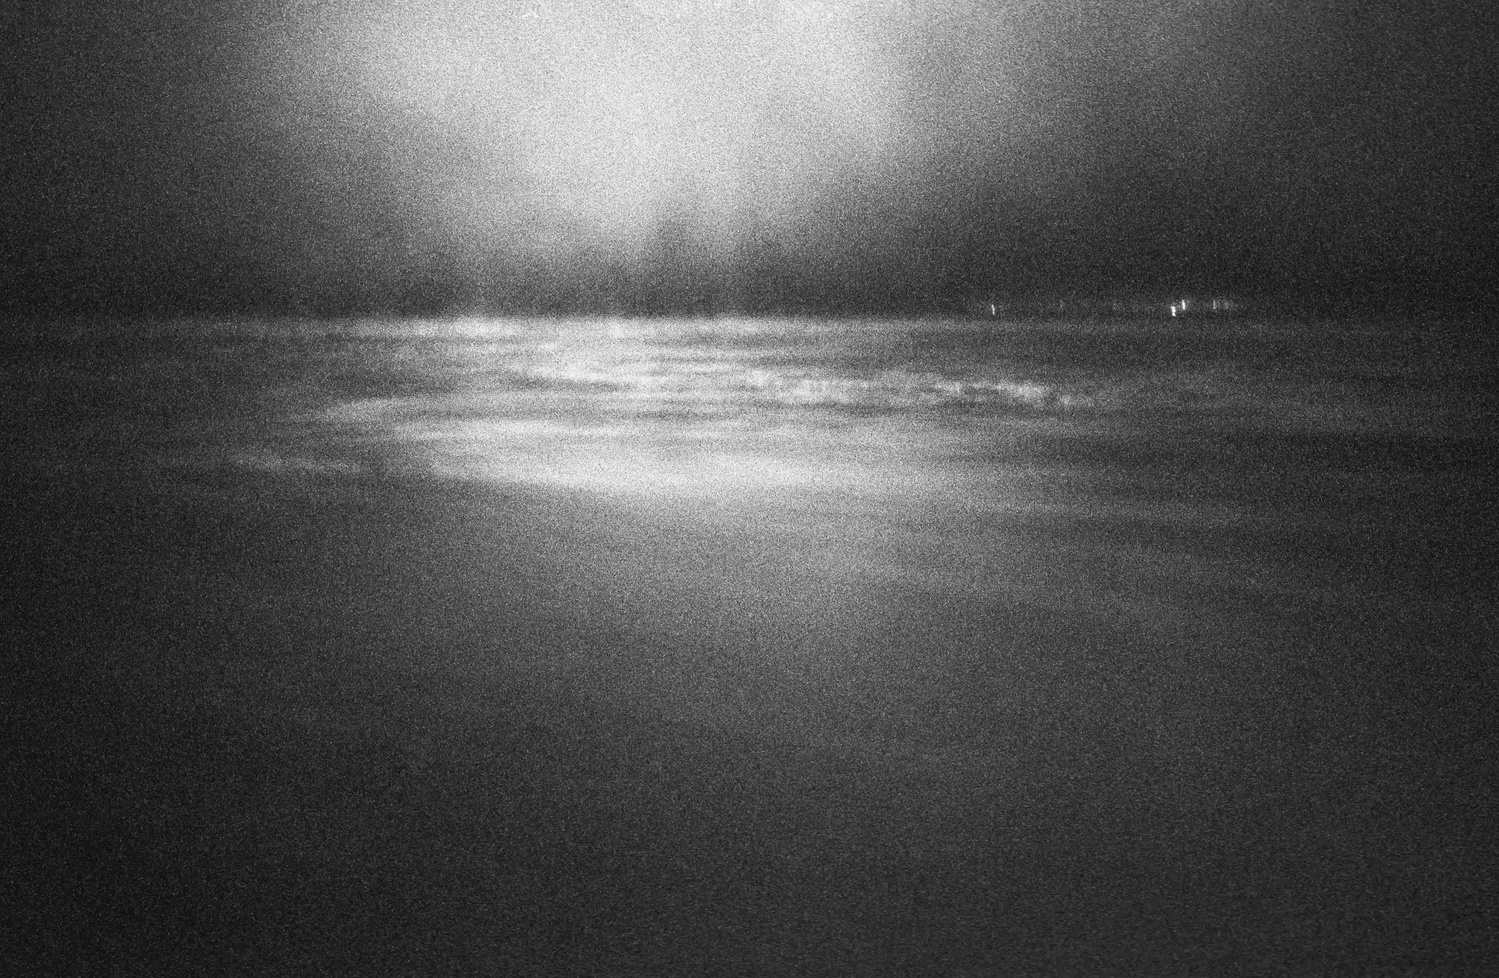 Untitled 2 by ke sang